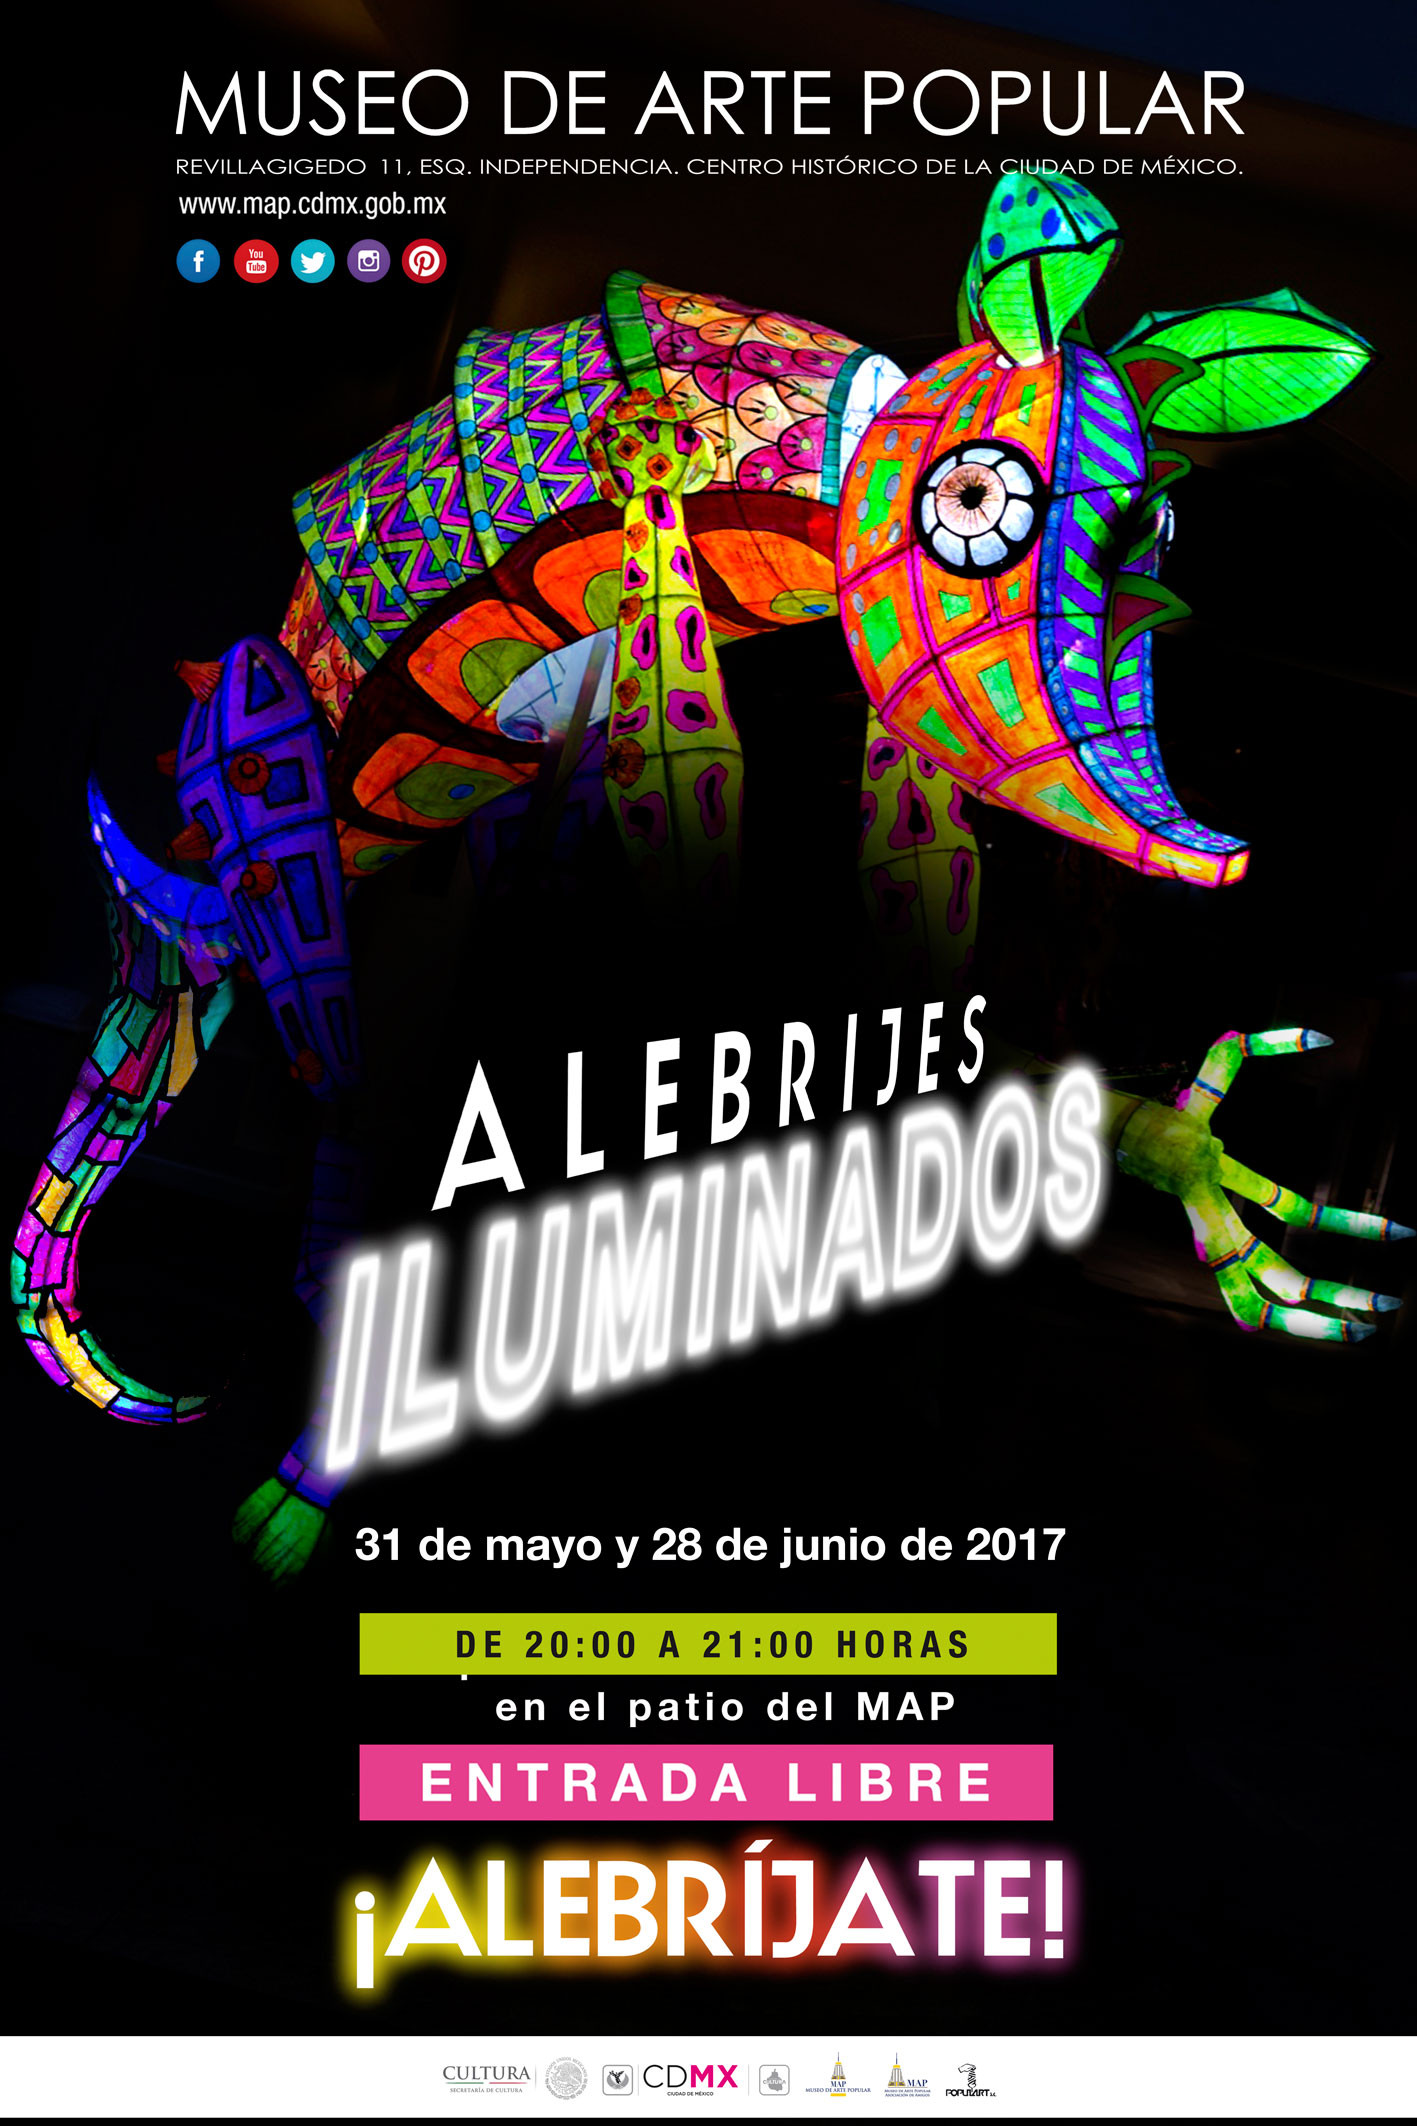 iluminados2017_web.jpg